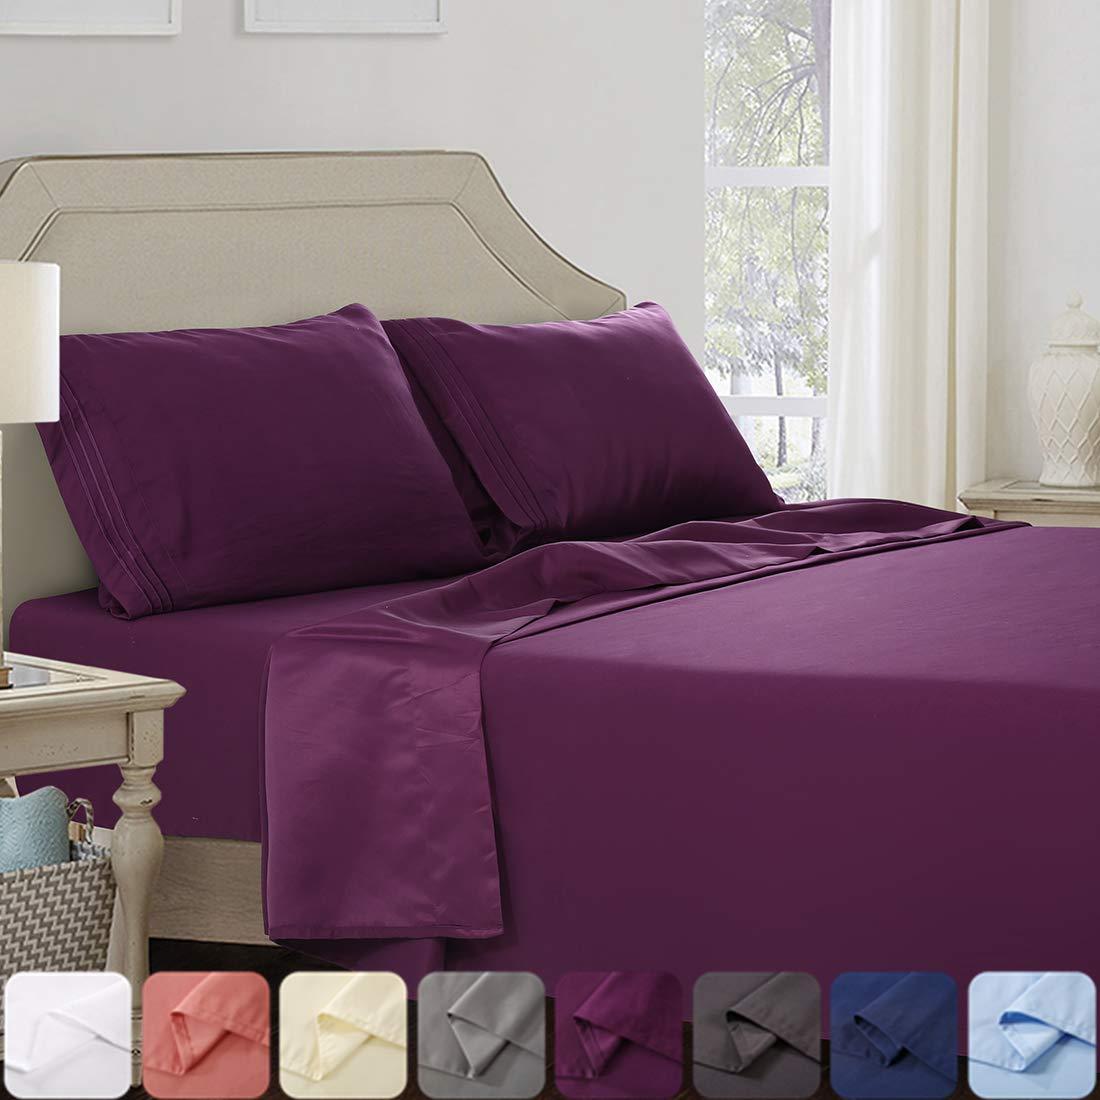 Abakan Full Bed Sheet Set 4 Piece Super Soft Brushed Microfiber 1800TC Hotel Luxury Premium Cooling Sheet Breathable, Wrinkle, Fade Resistant Deep Pocket Bedding Sheet Set (Full, Purple)